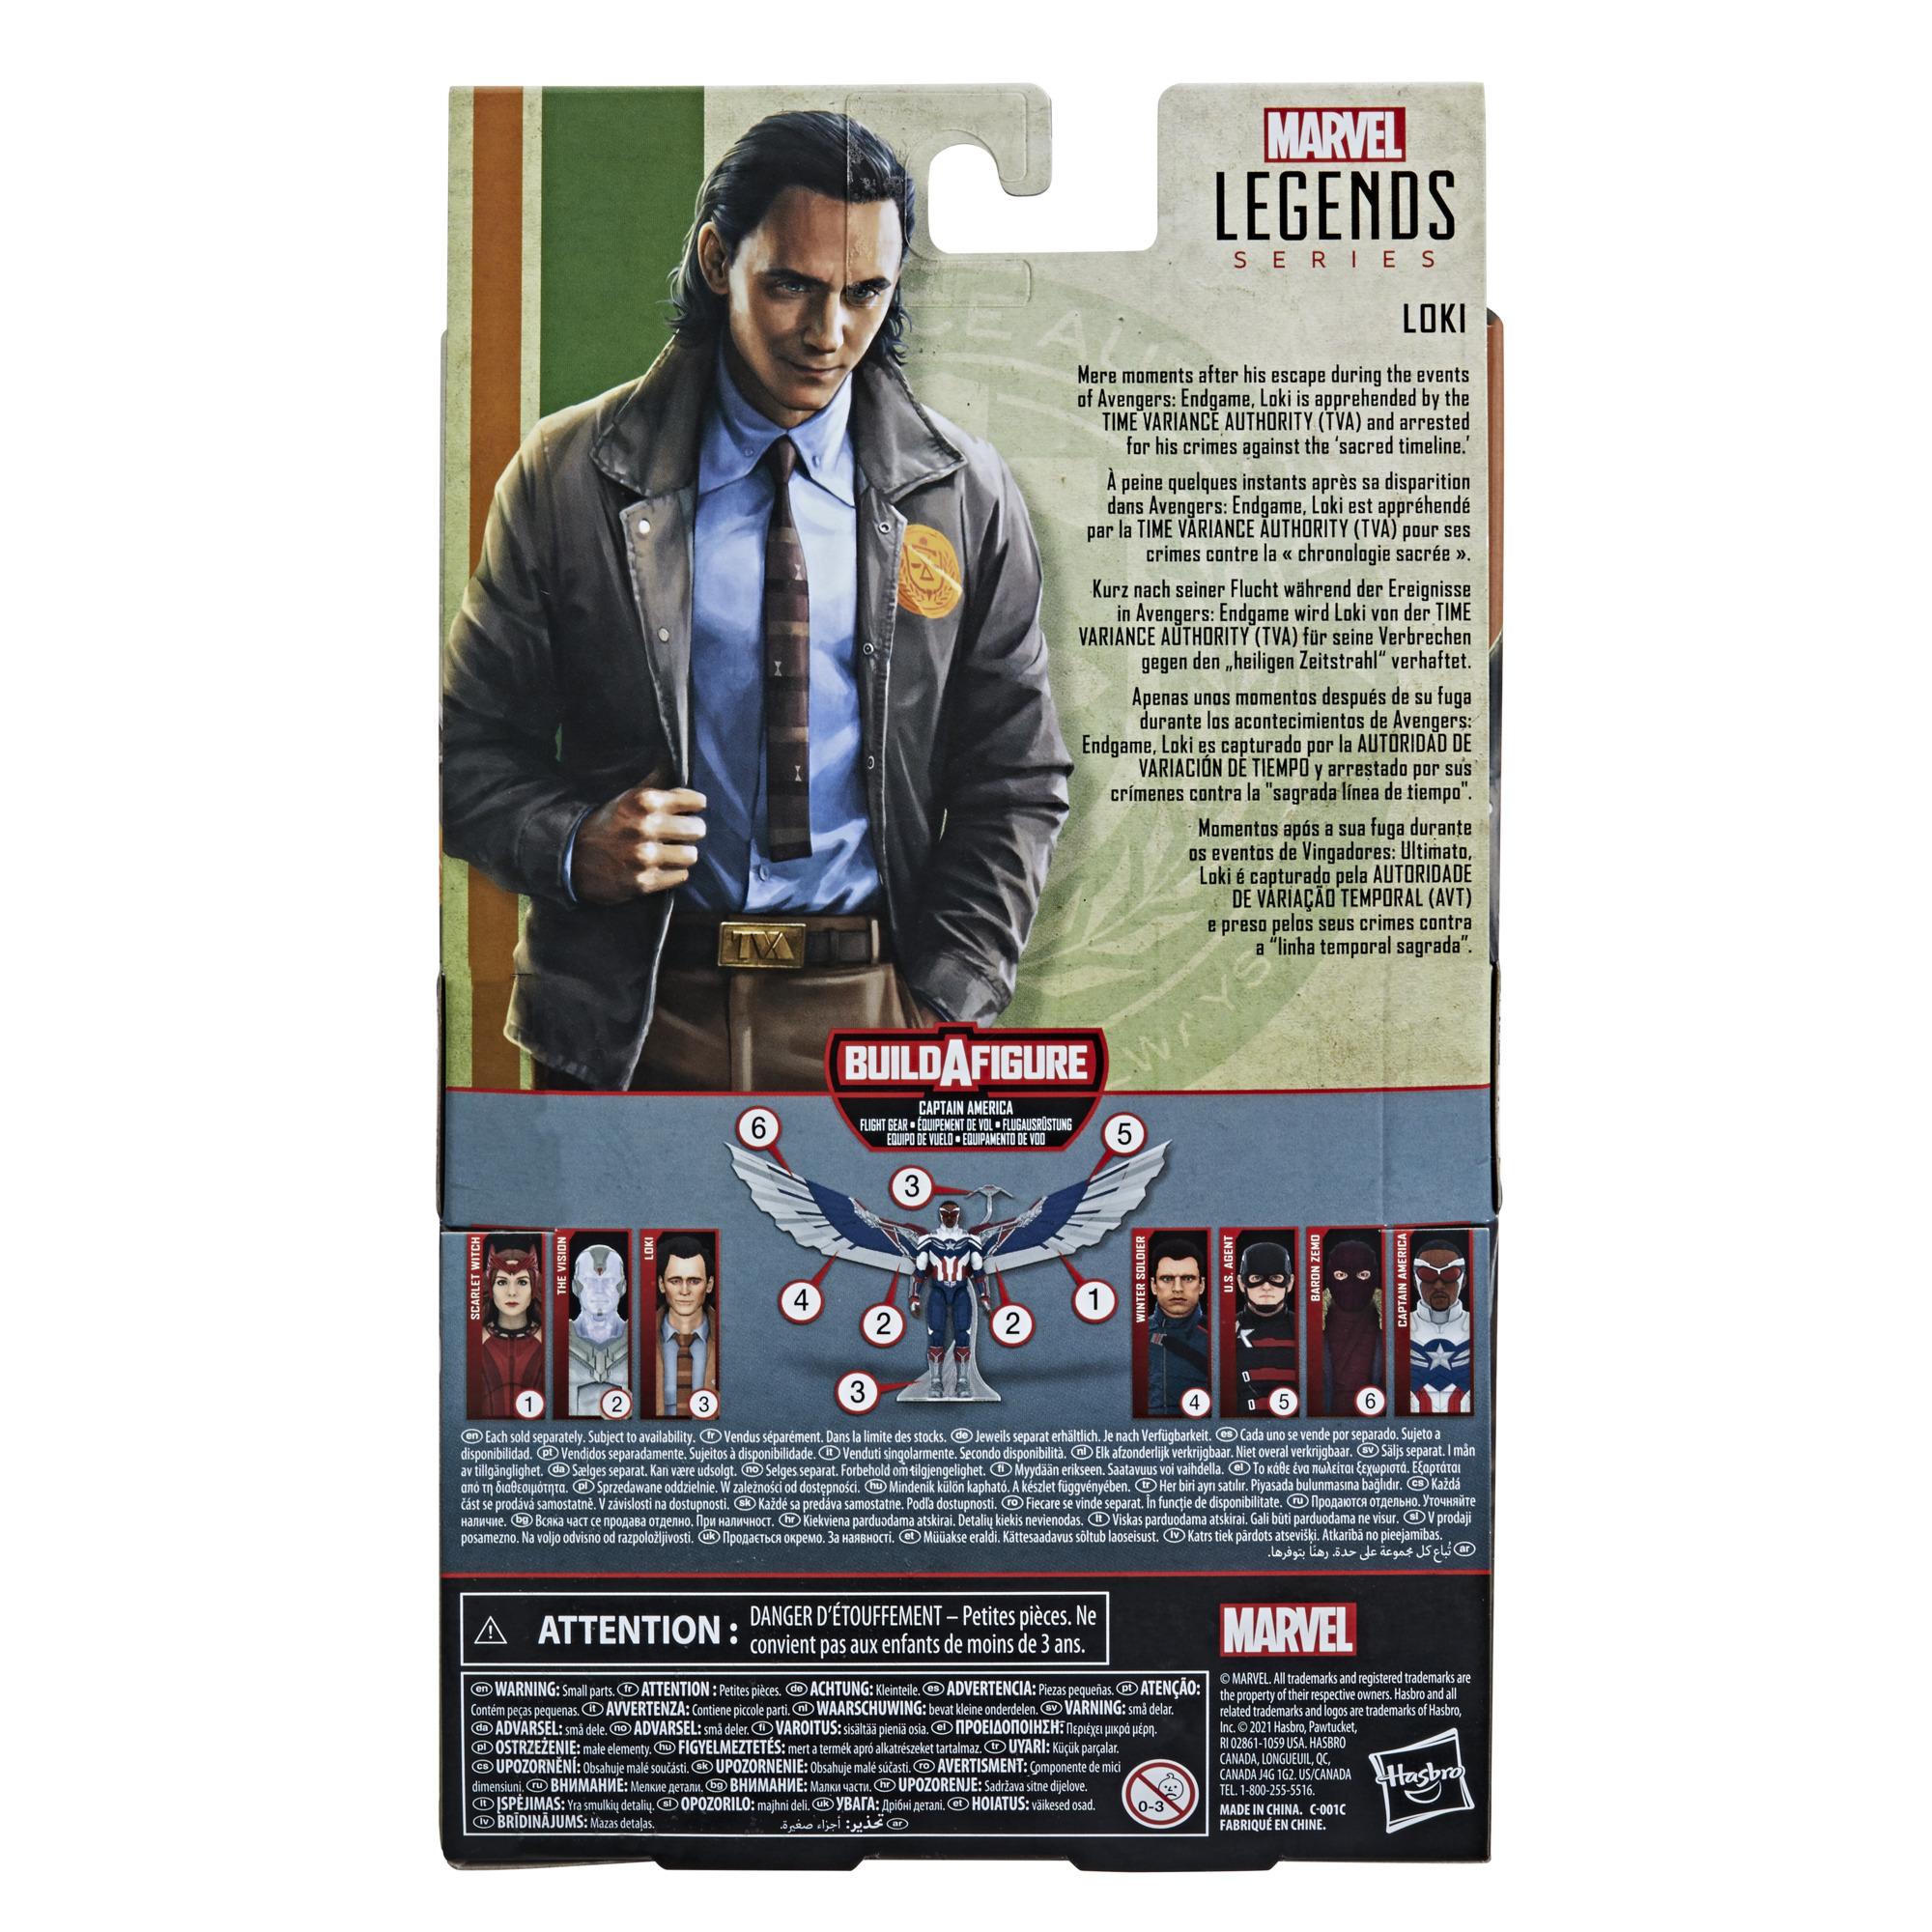 Marvel Legends Series Avengers Loki Build a Figure F0327 5010993790982